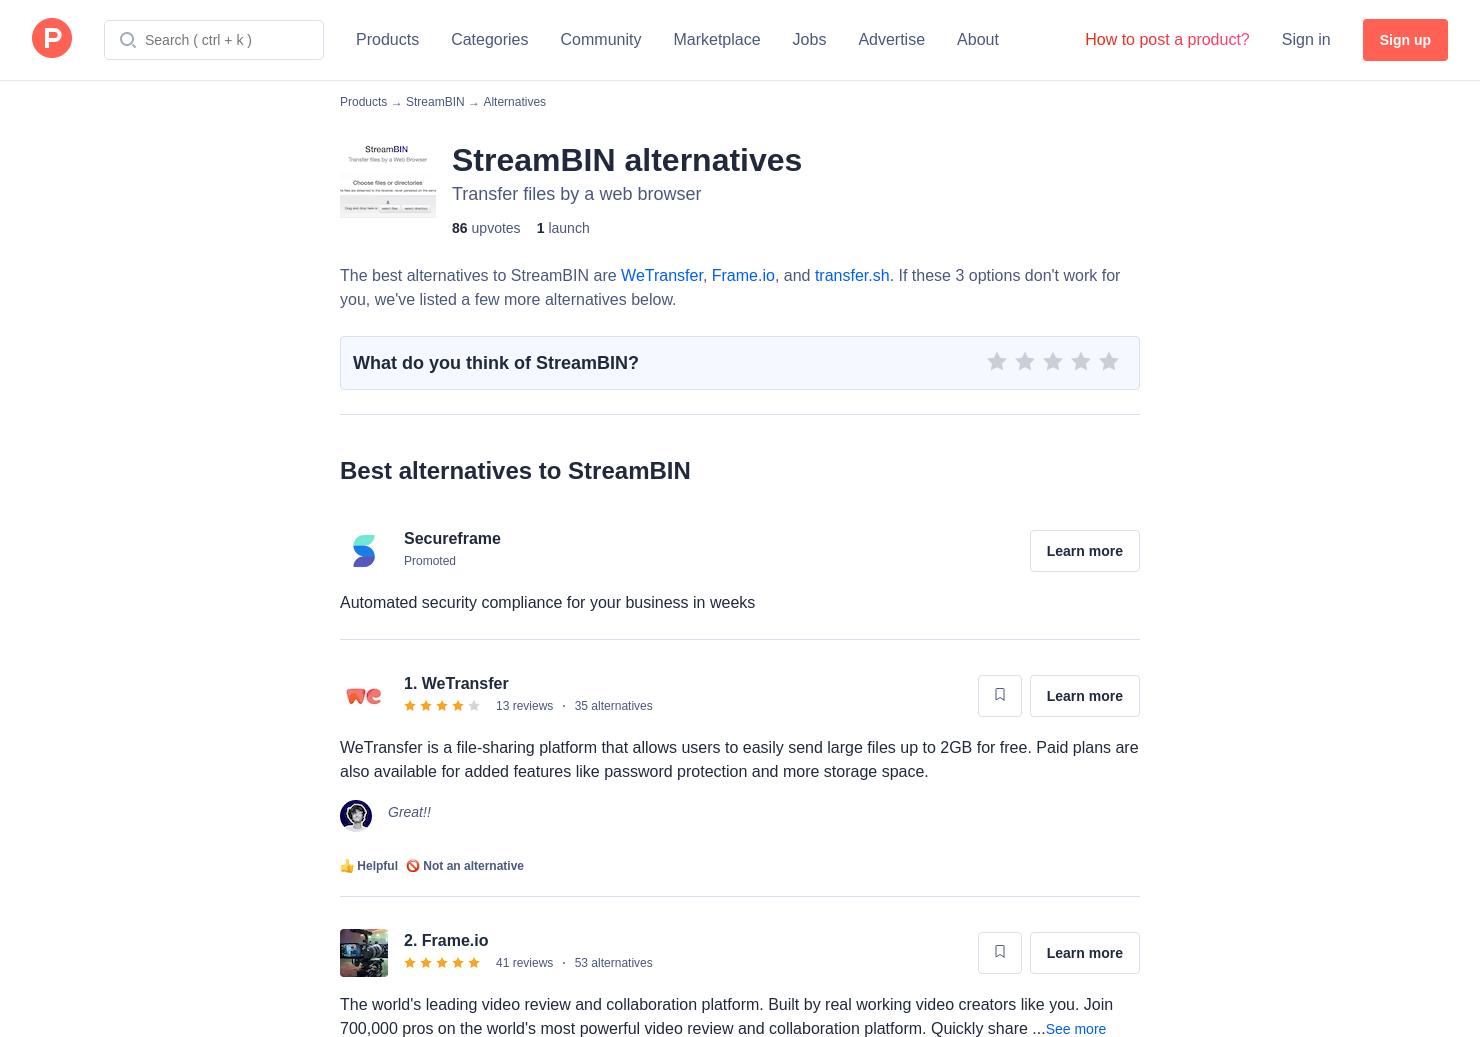 5 Alternatives to StreamBIN | Product Hunt